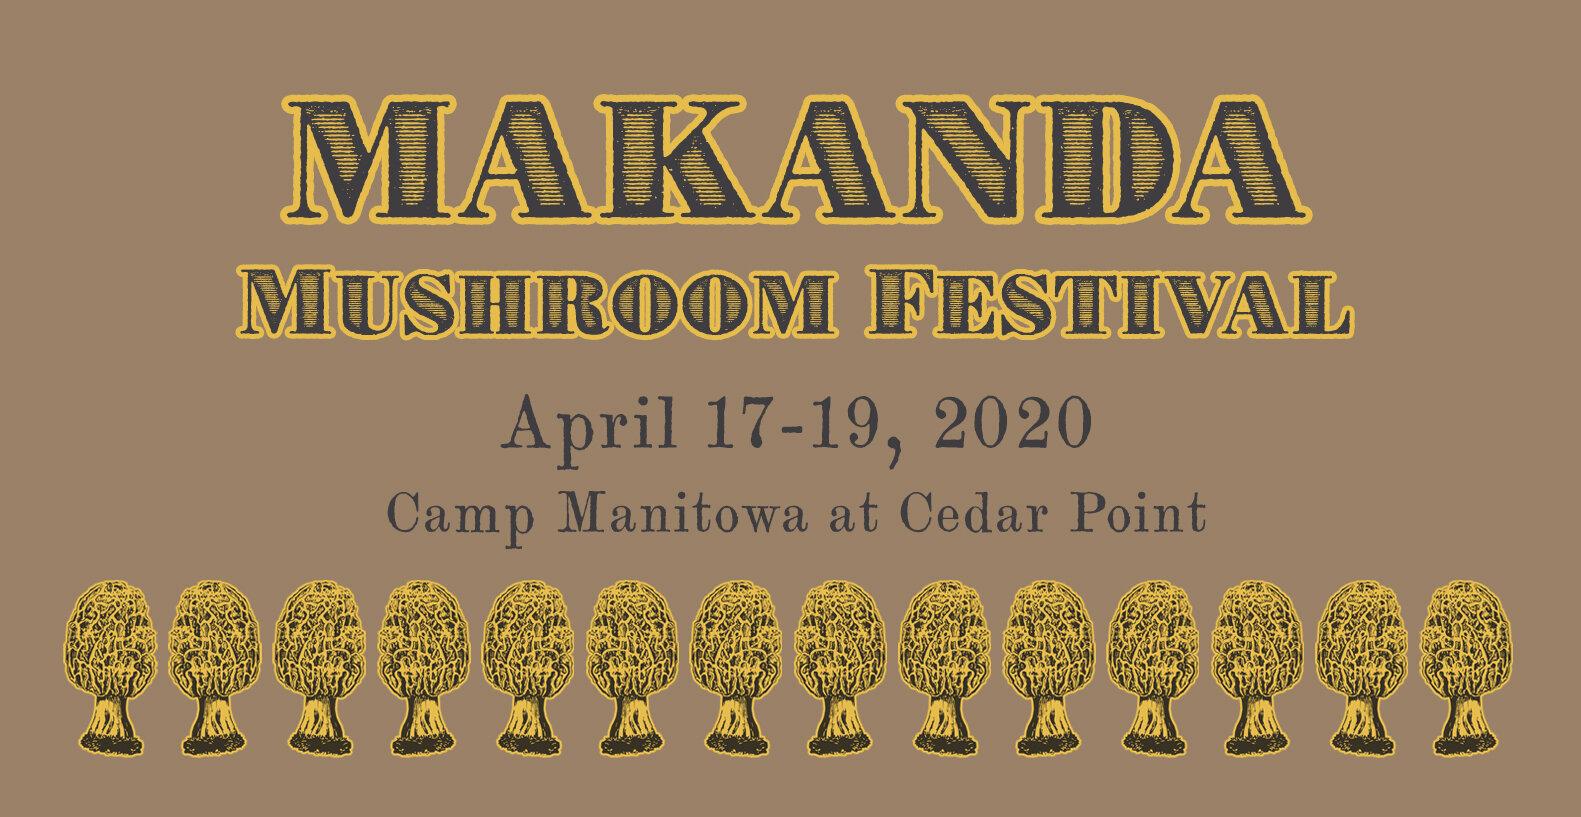 Mushroom Festival 2020.Makanda Mushroom Festival April 17 19 2020 Lily The